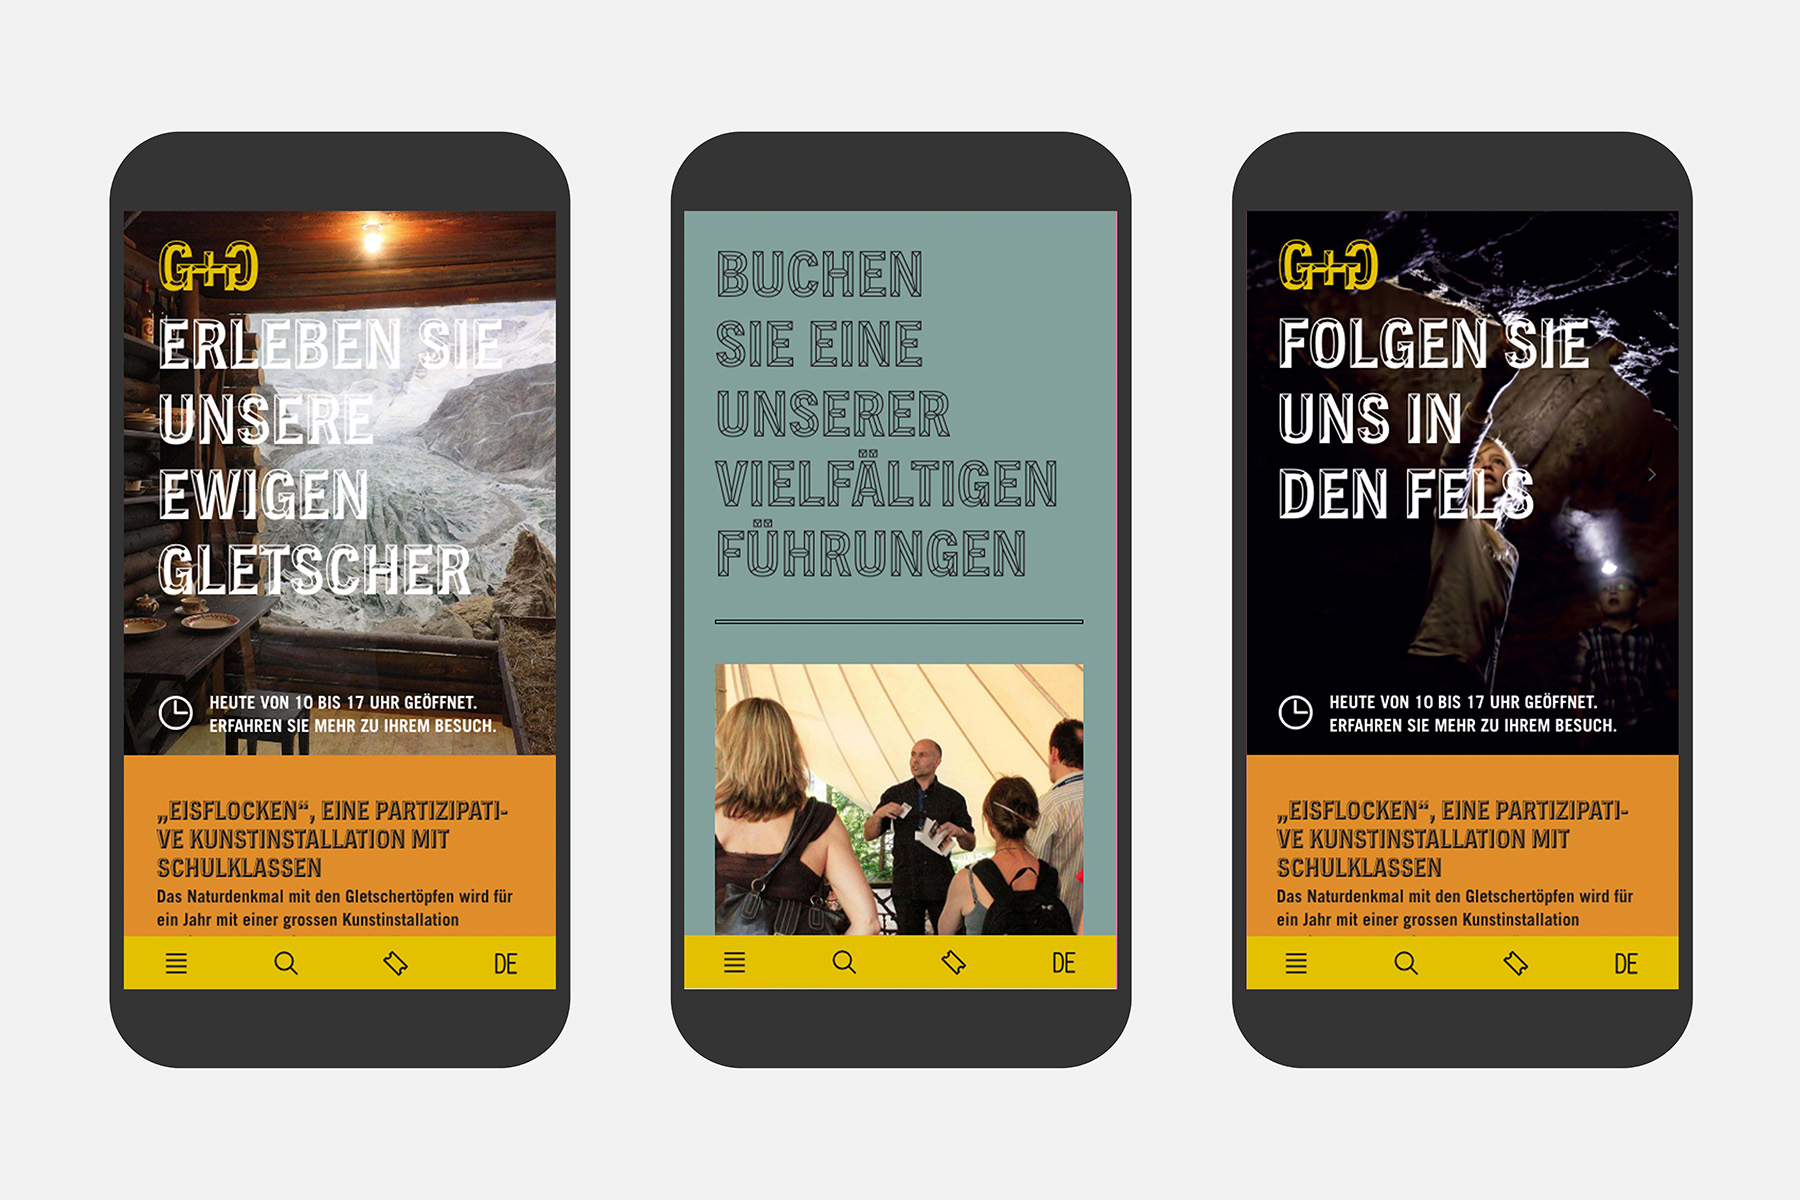 Gletschergarten Luzern Web UX Mobile